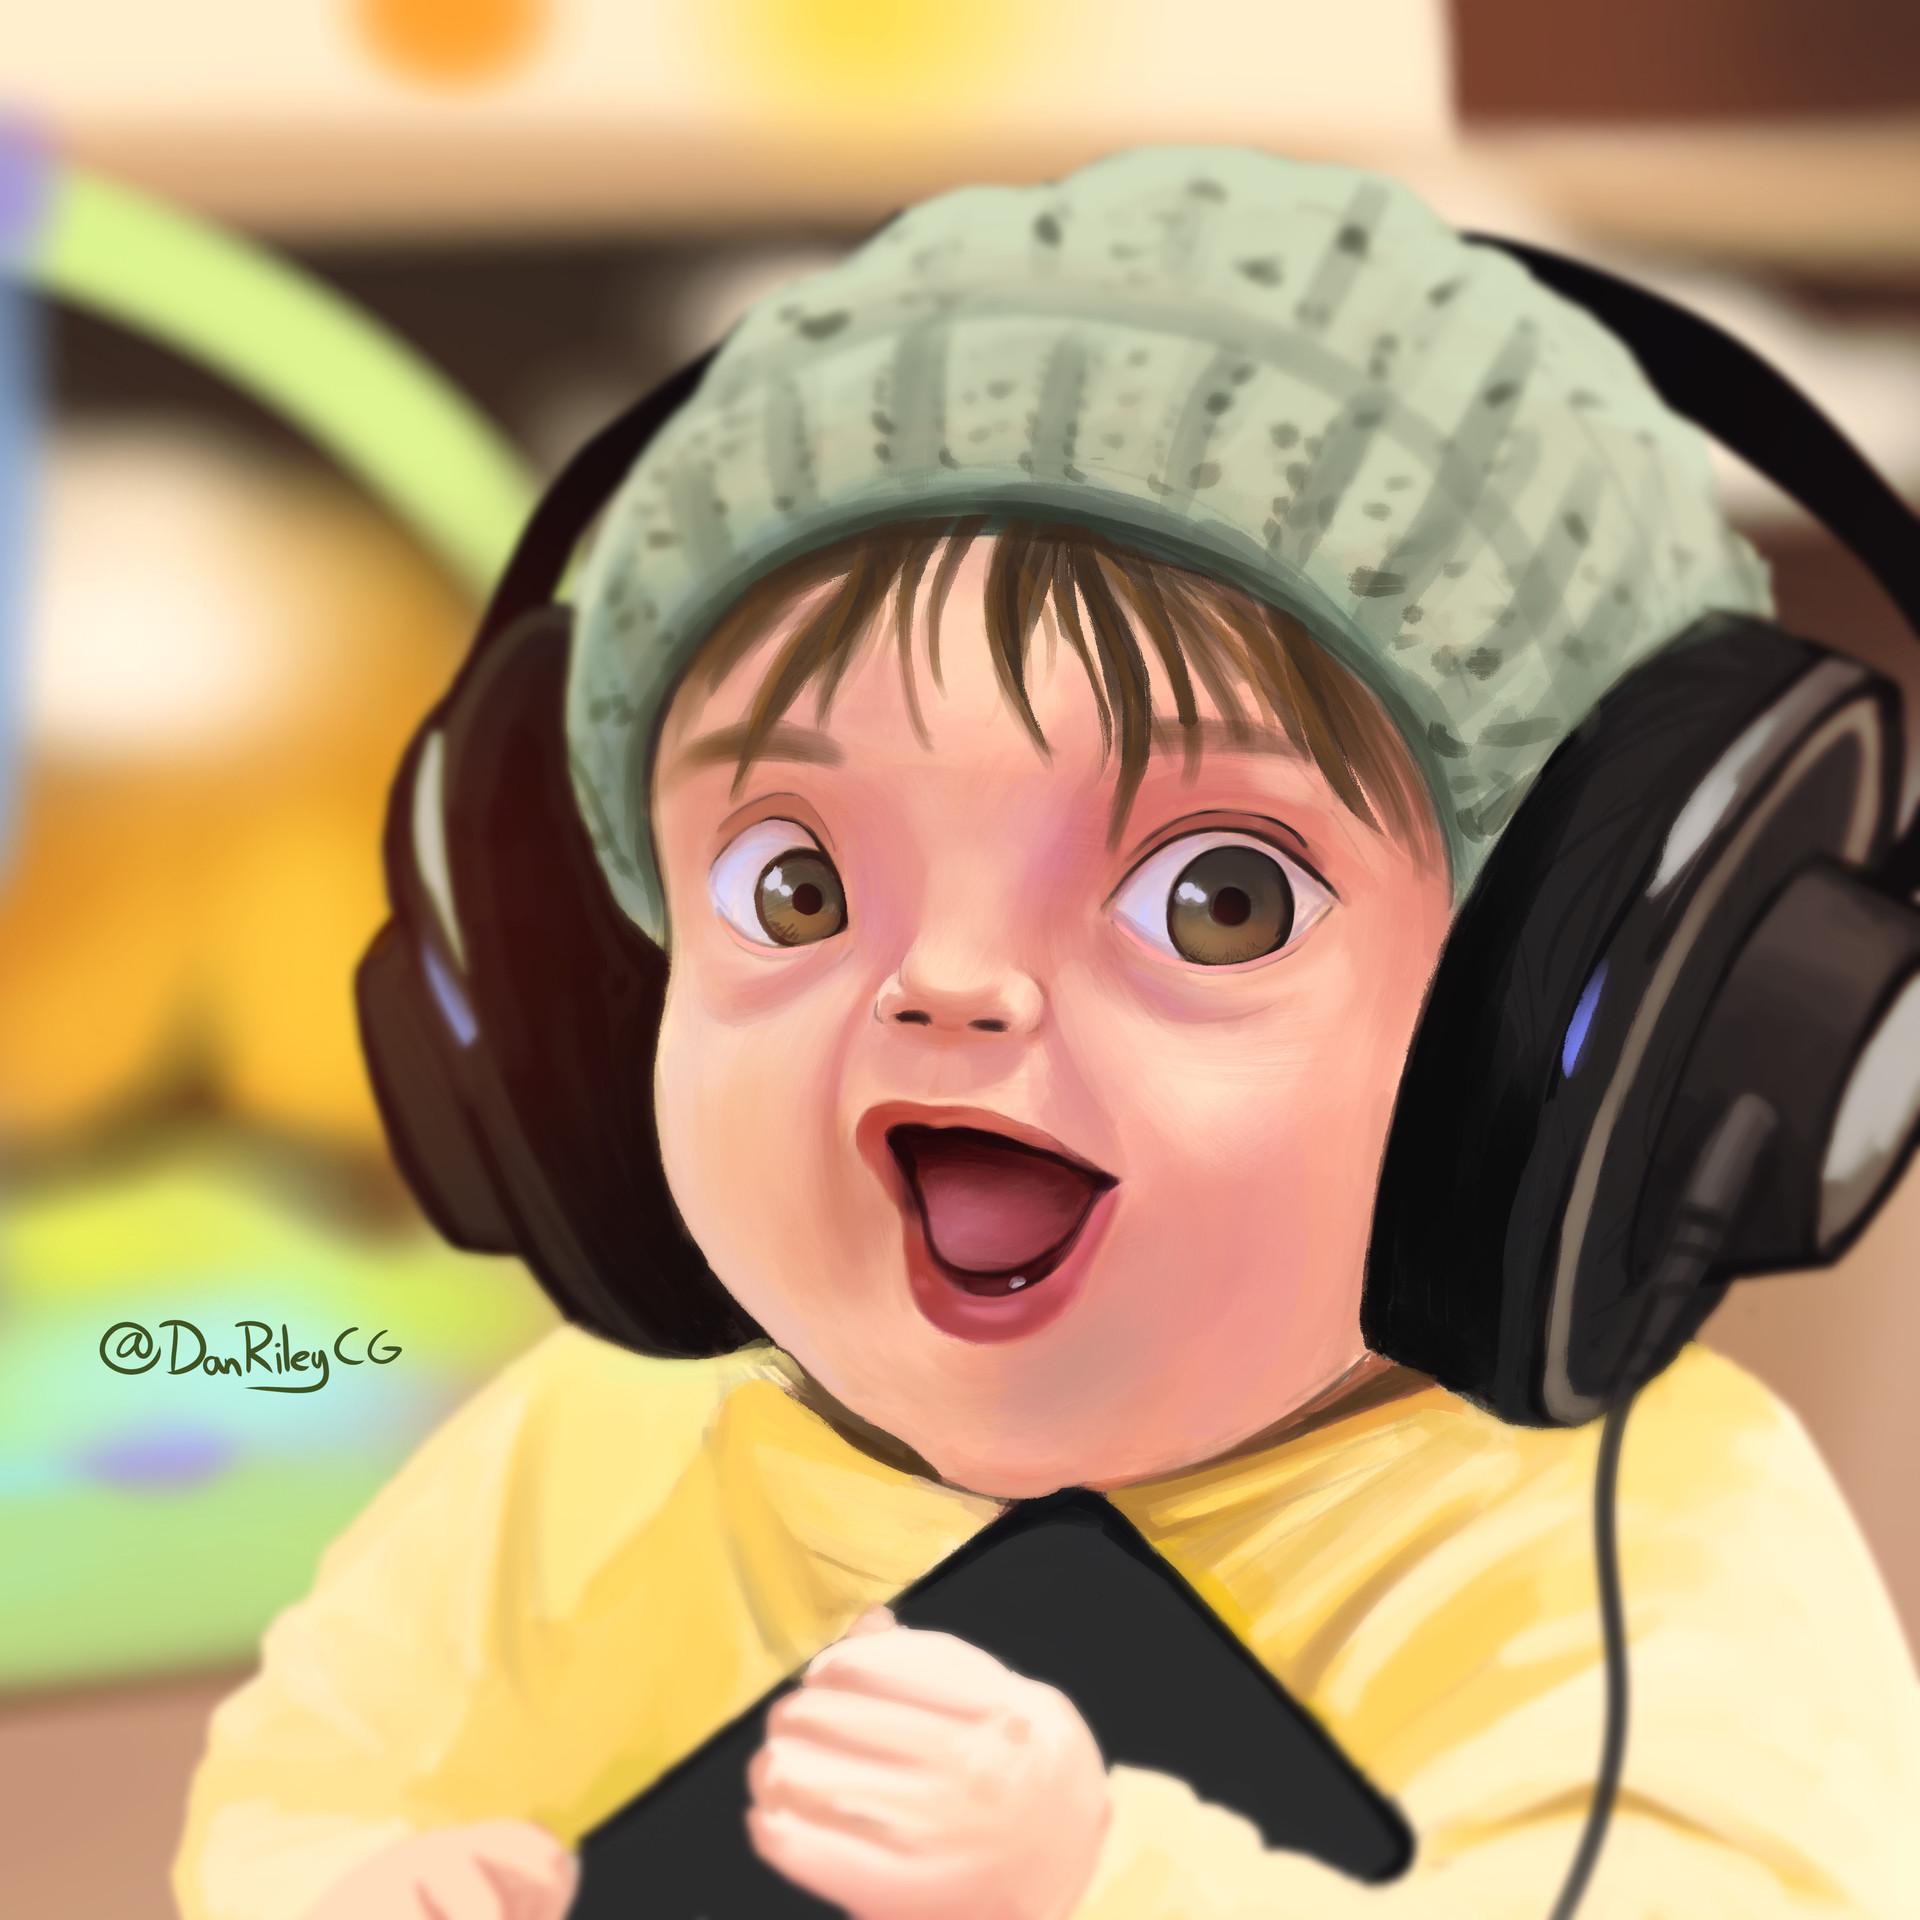 ArtStation - Headphones Baby (Reddit Gets Drawn), Dan Riley